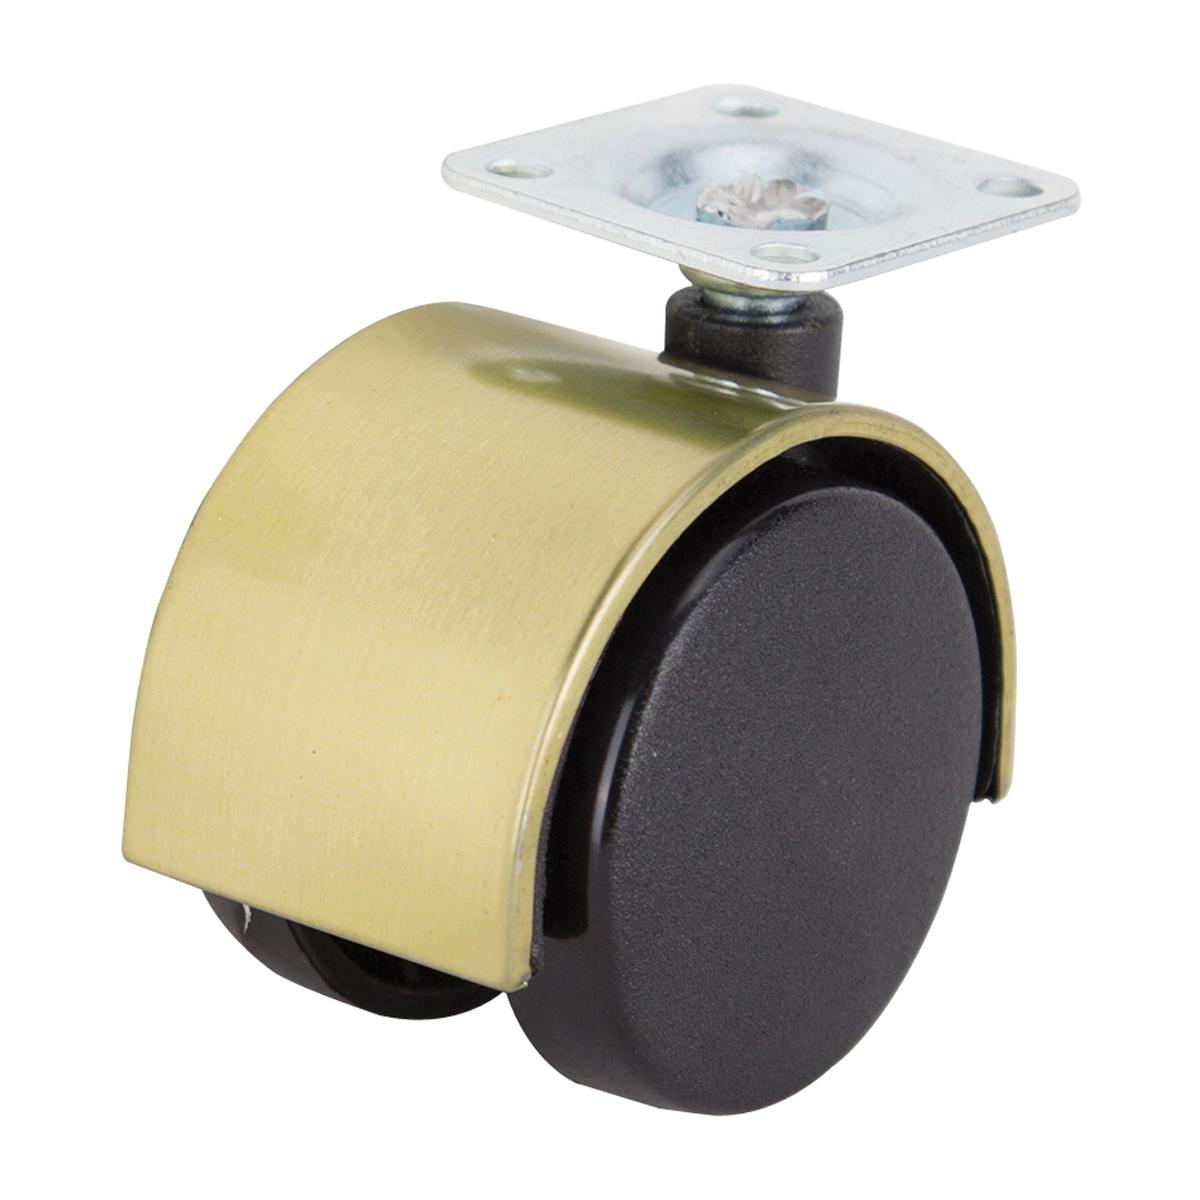 Picture of ProSource JC-F12-PS Caster, 2 in Dia Wheel, Nylon Wheel, Black, 75 lb